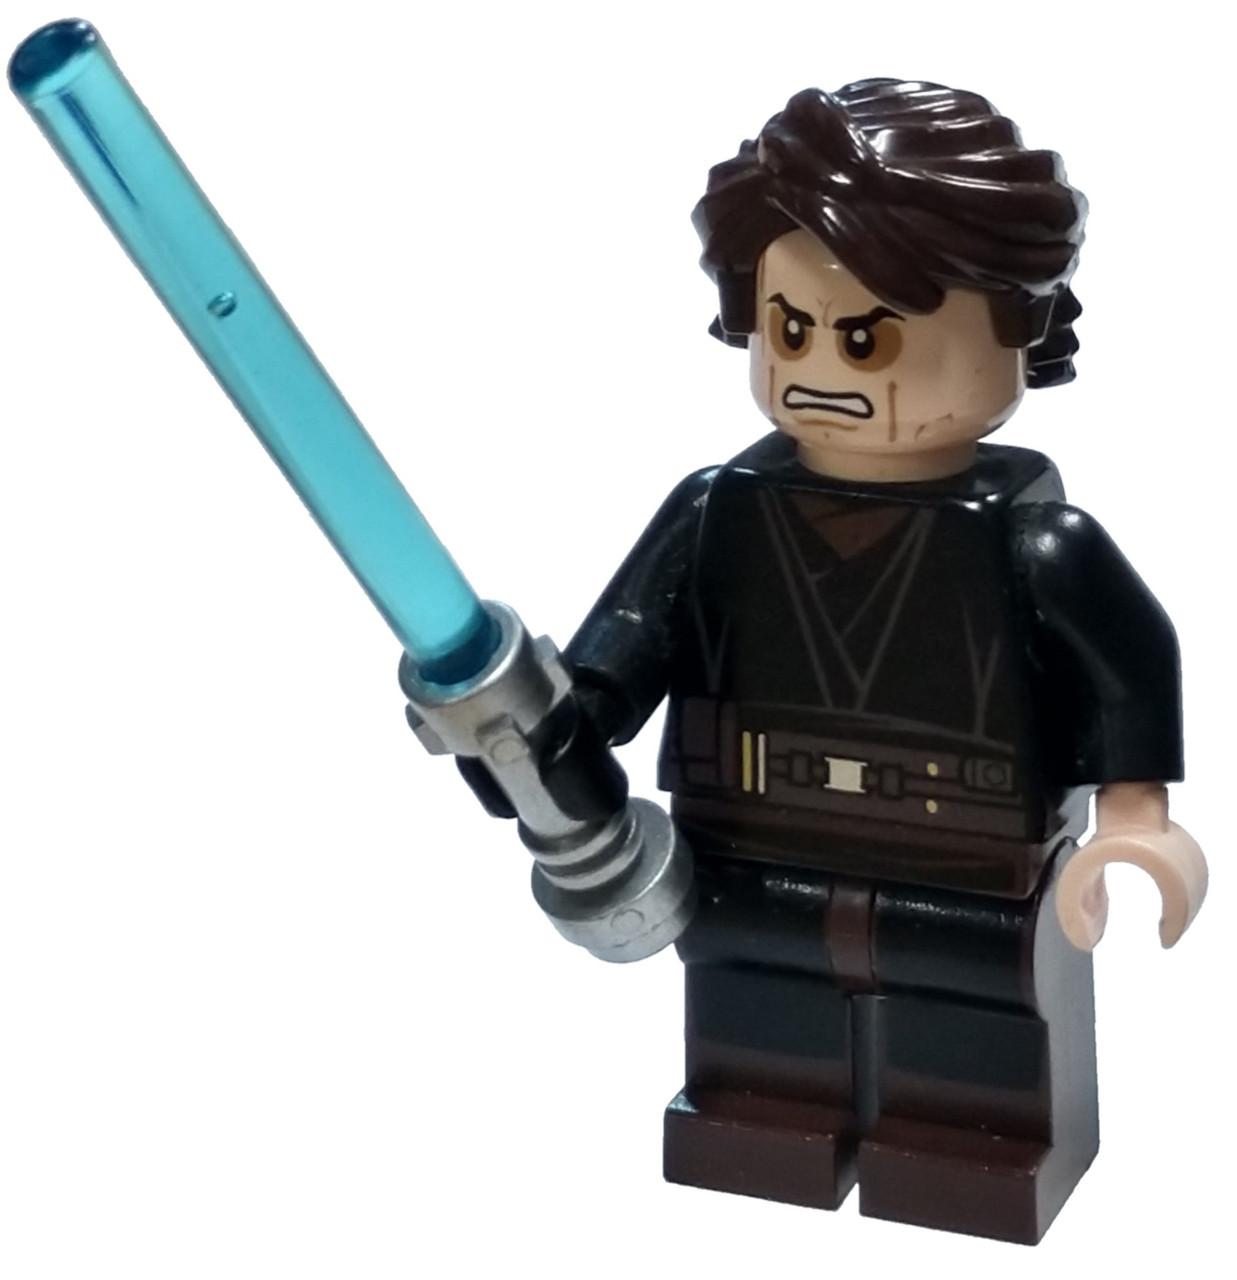 LEGO Star Wars Episode 3 Anakin Skywalker Minifigure Sith ...